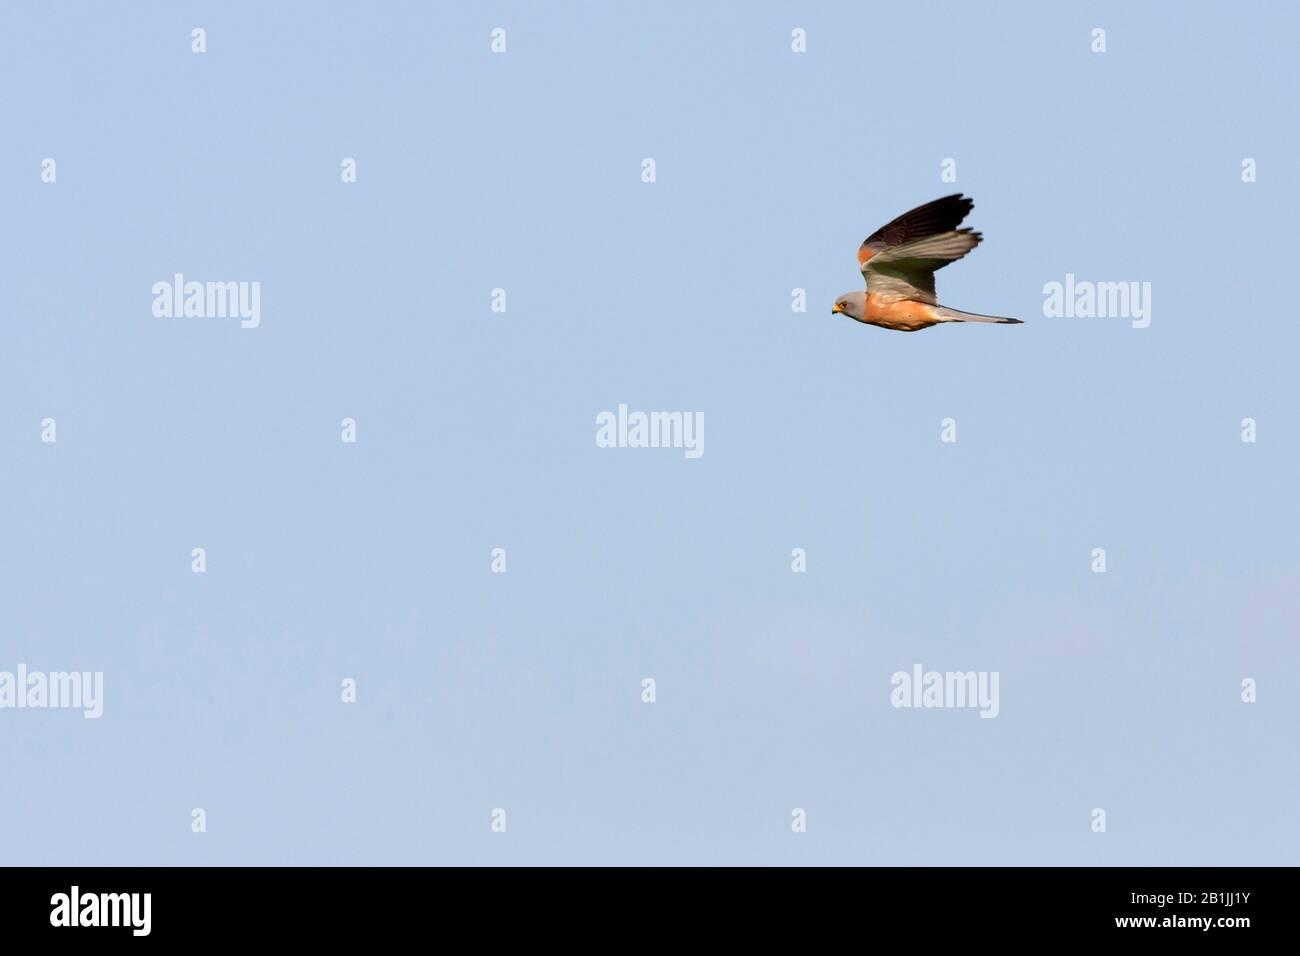 lesser kestrel (Falco naumanni), adult male, Turkey Stock Photo